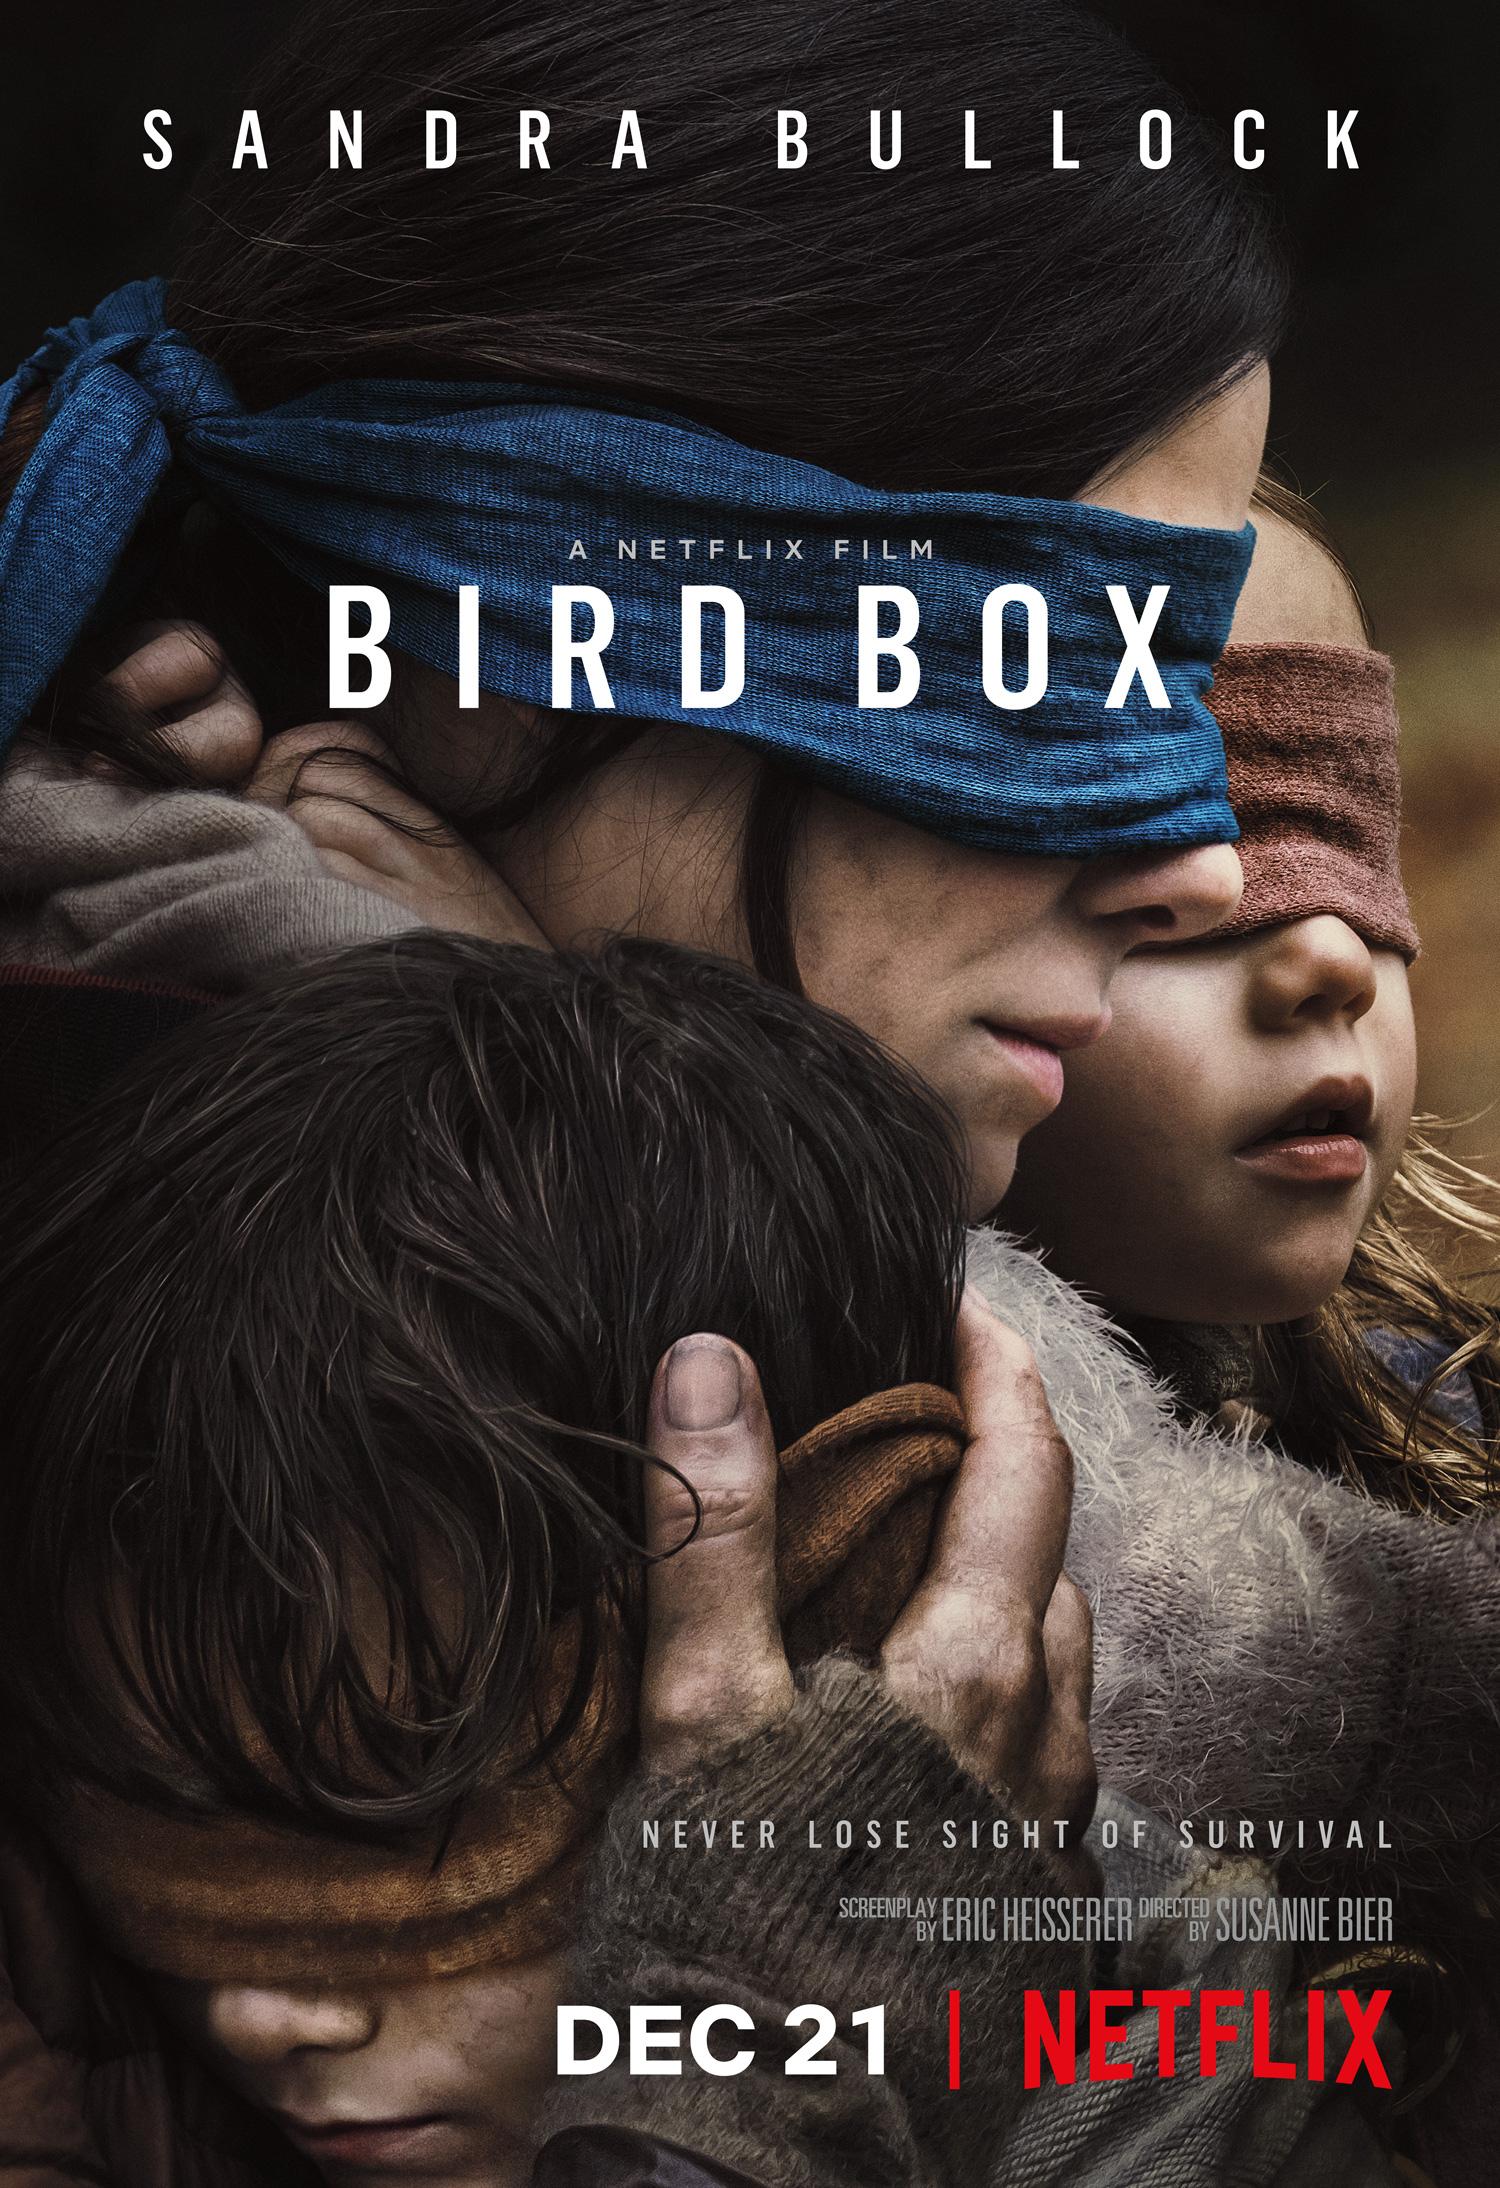 Bird Box film review: Sandra Bullock shines in Susanne Bier's post-apocalypse